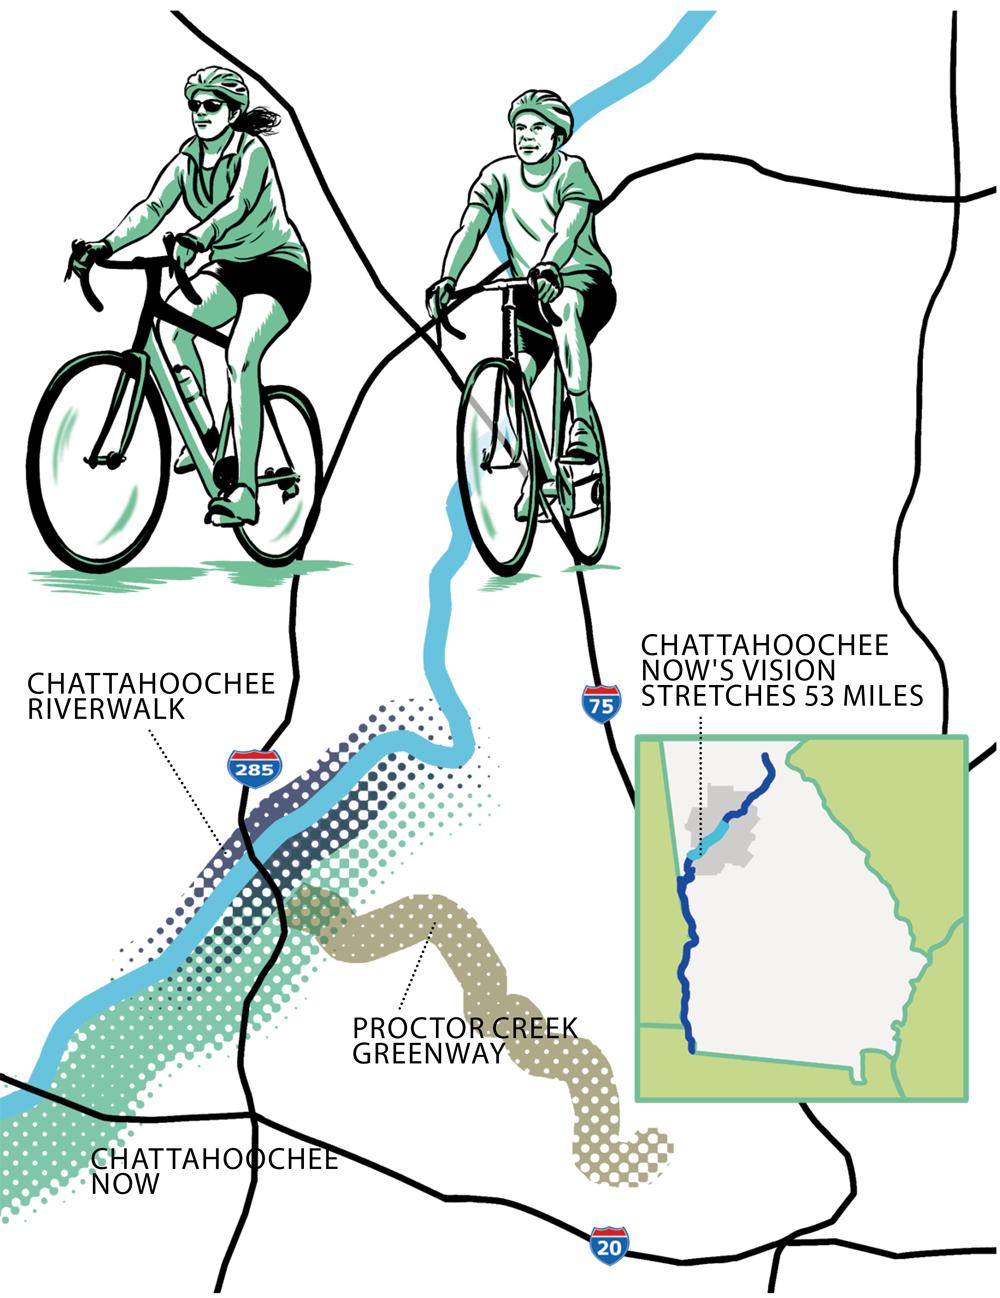 Chattahoochee Future Map